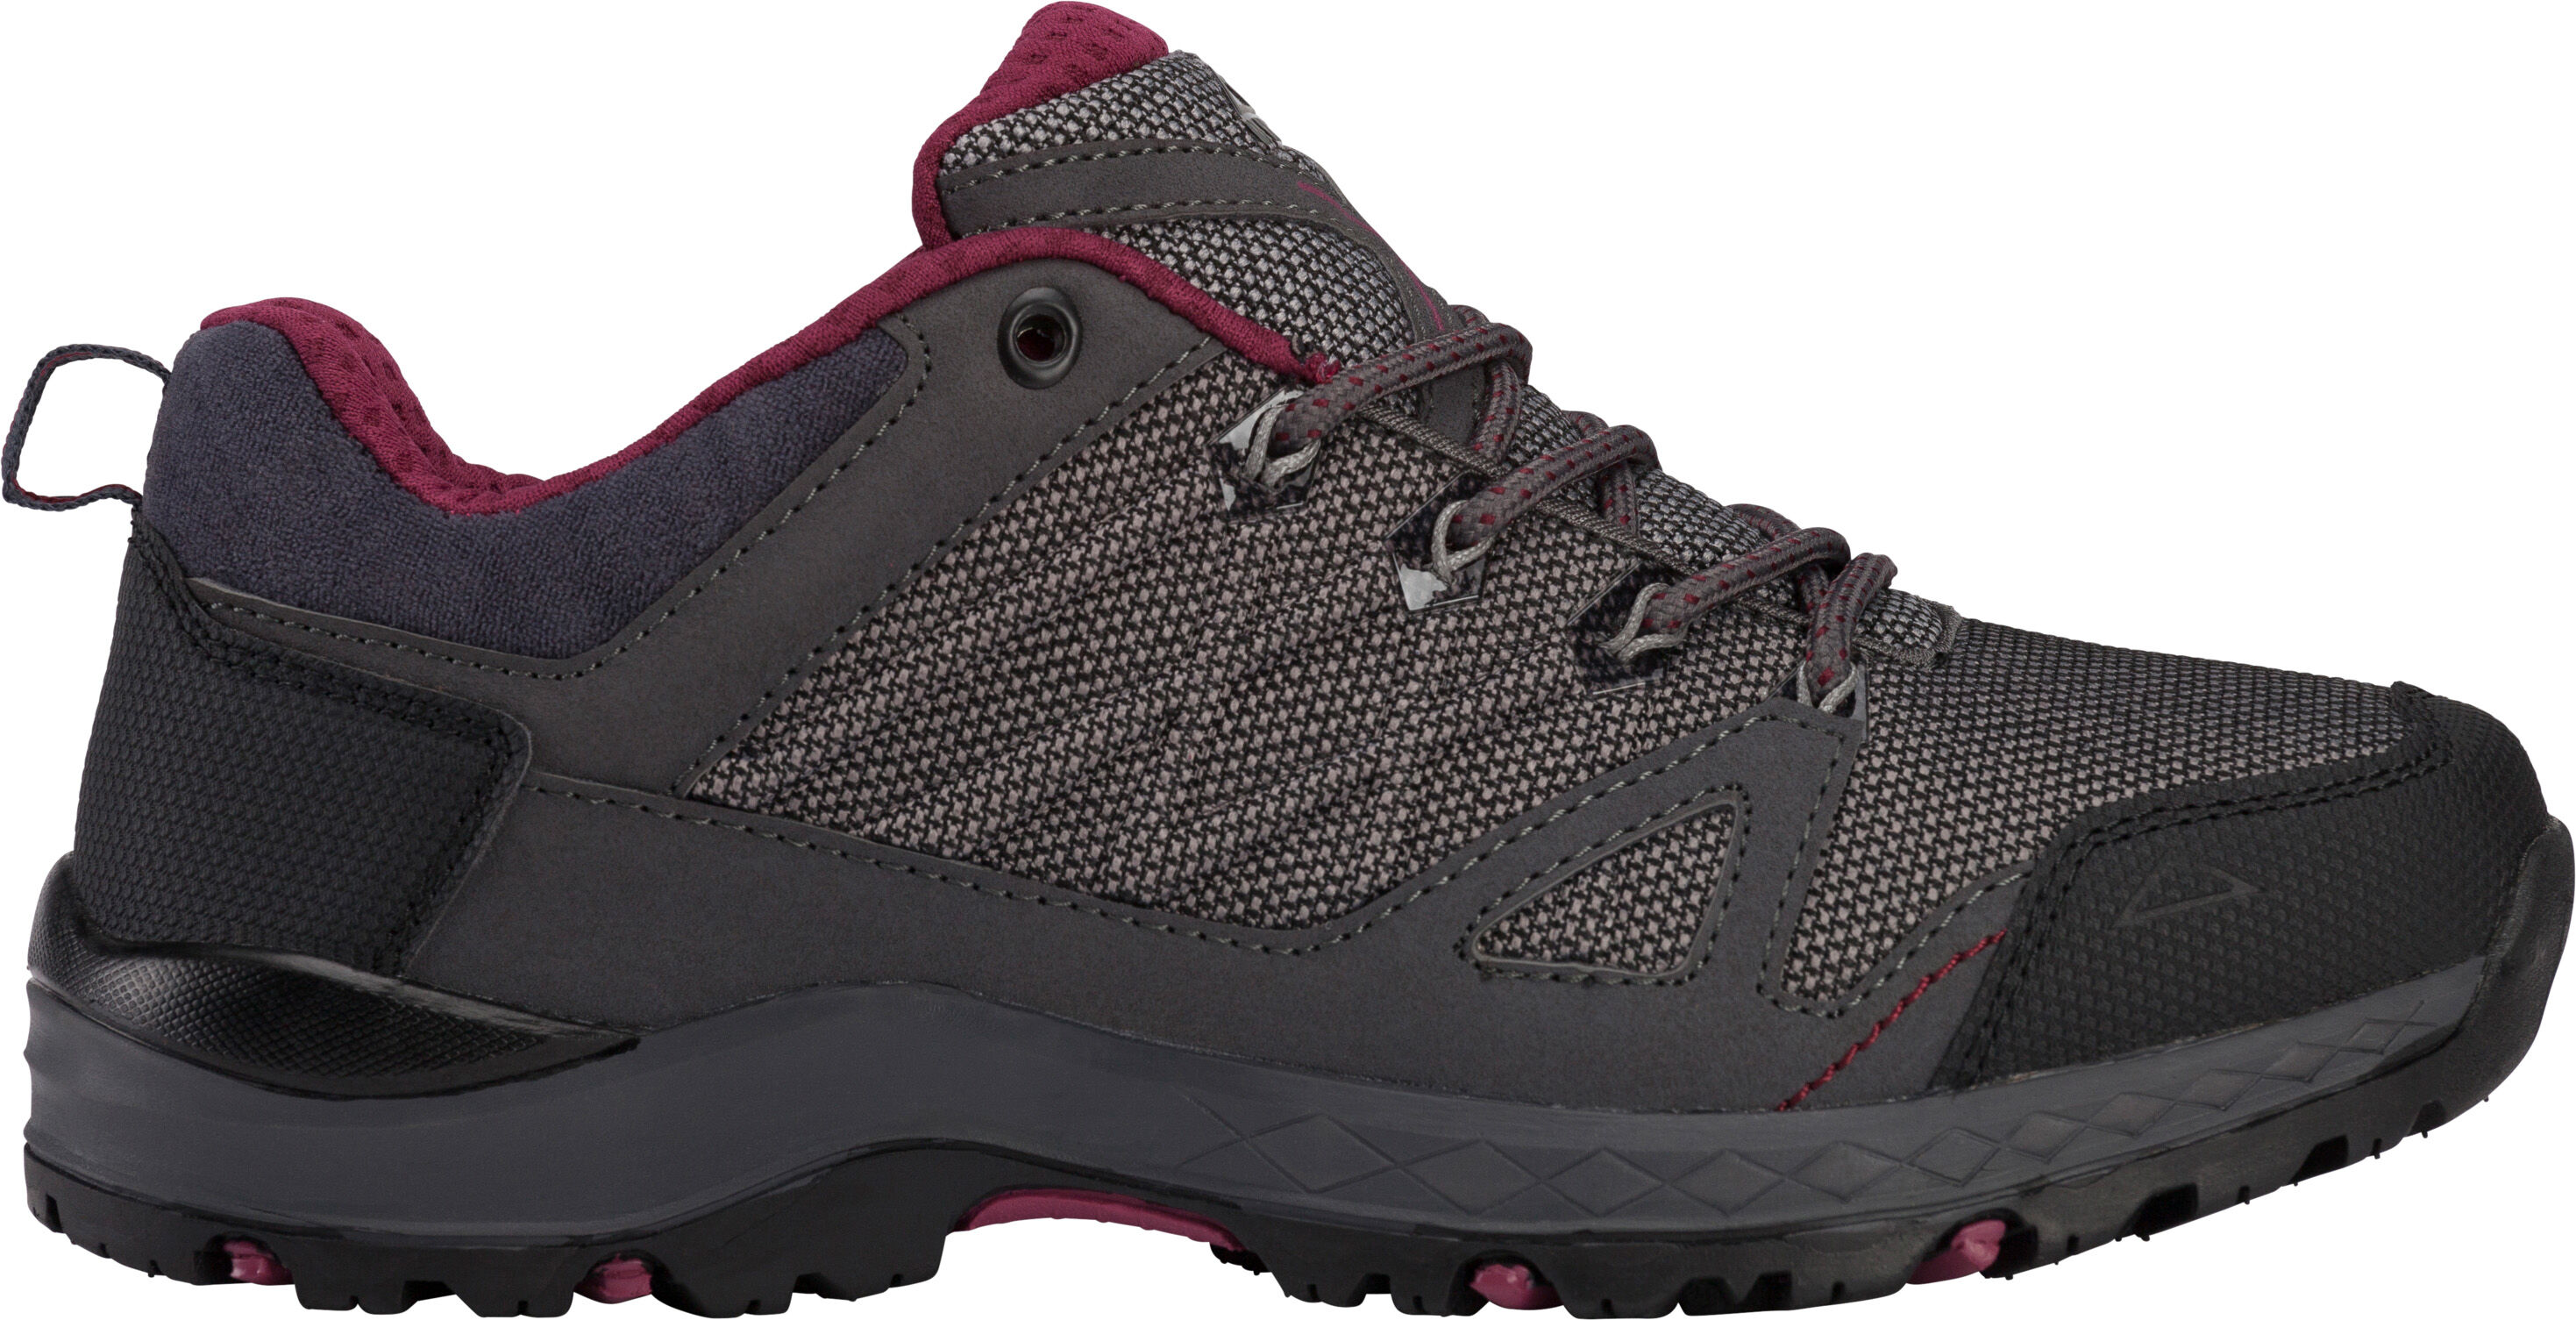 Zapatillas De Montaña Salomon Savica Trail W Mujer Rojo